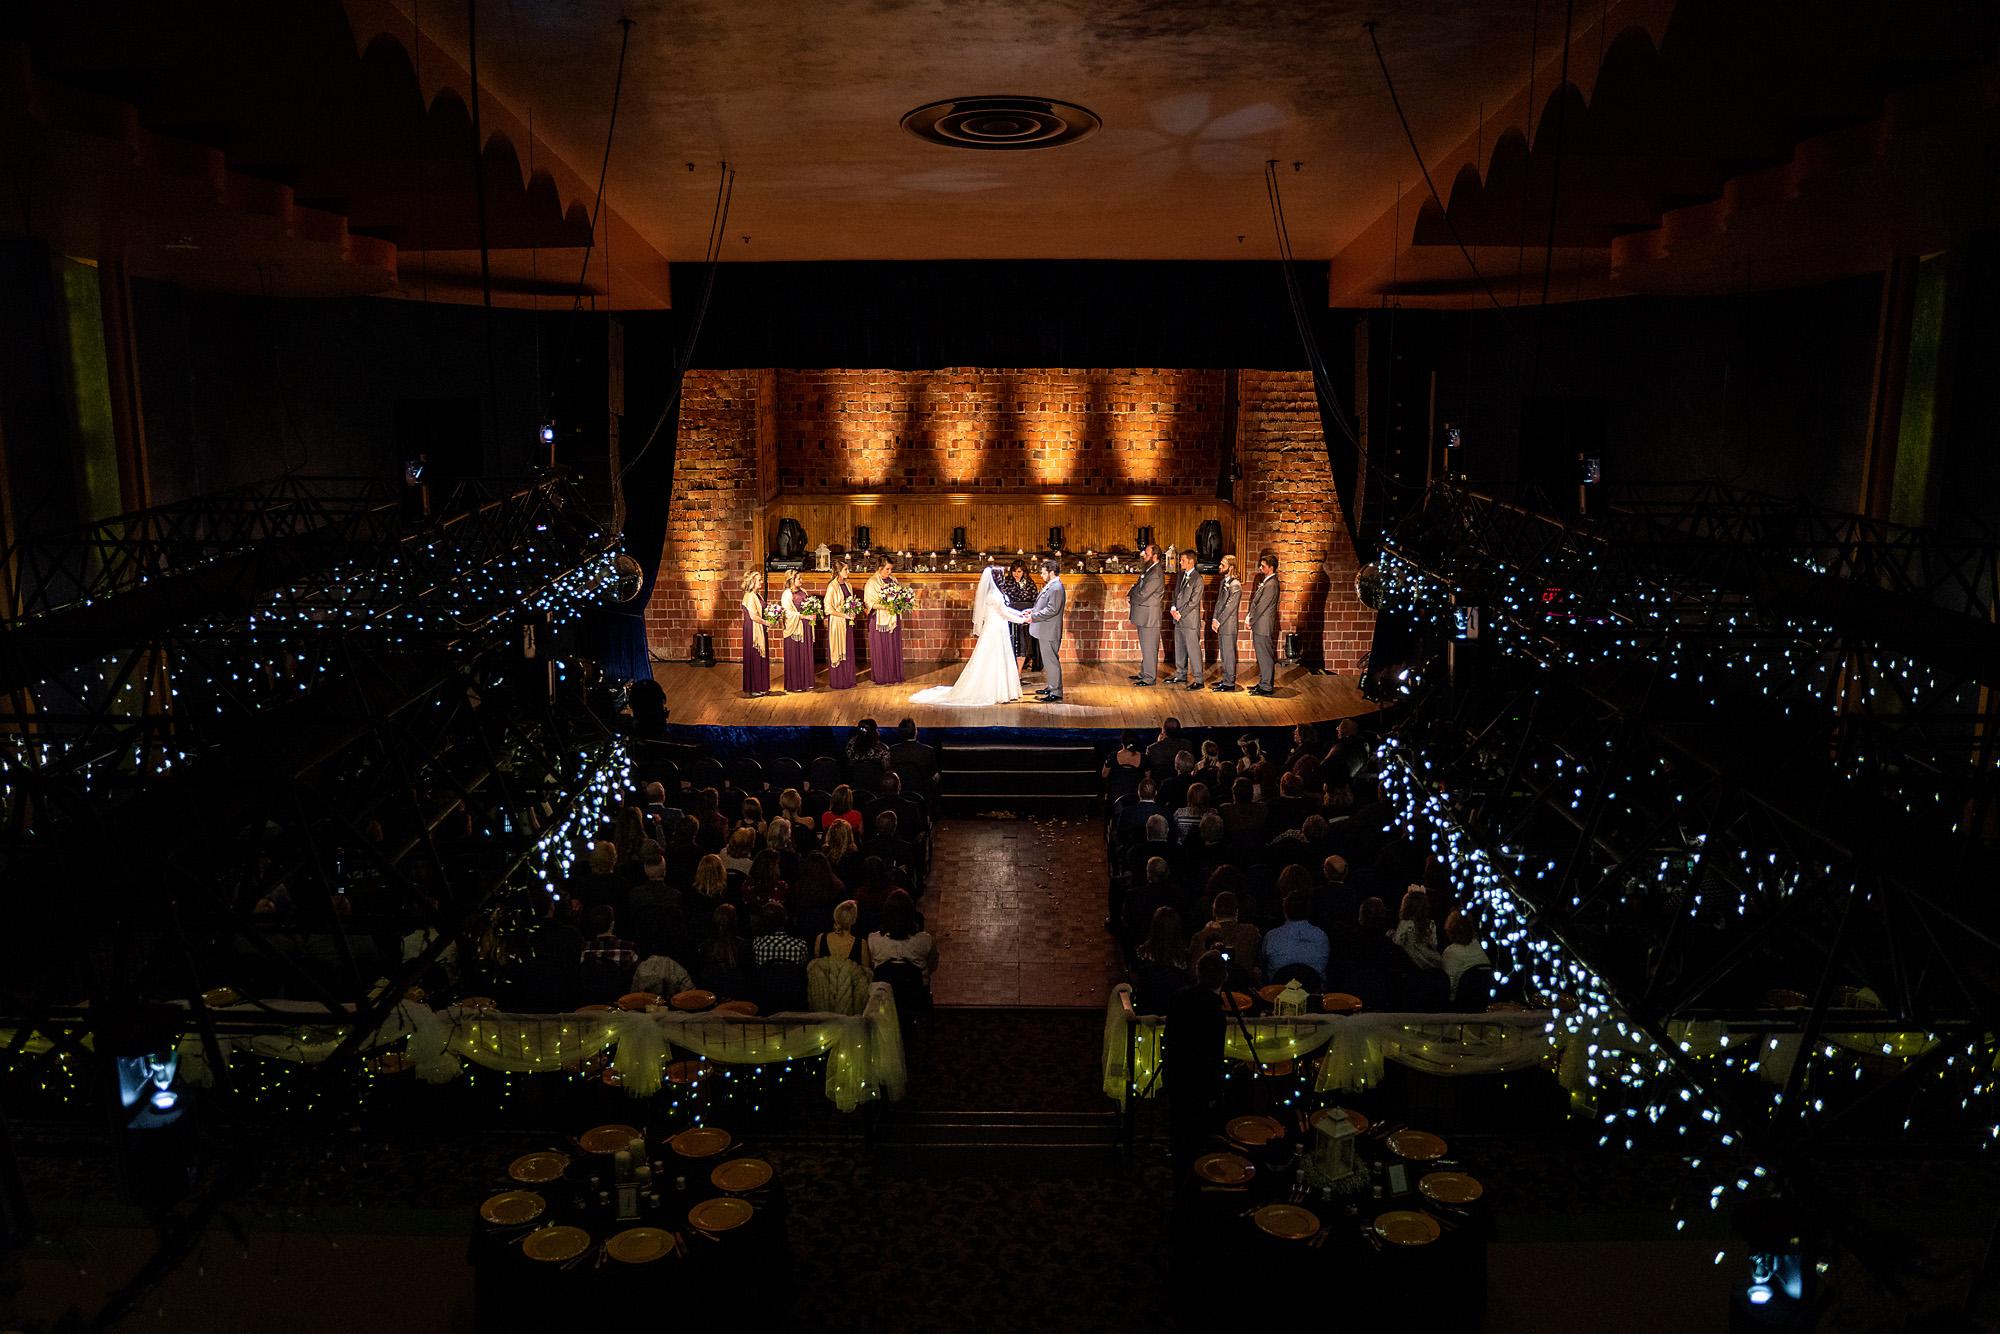 20th-Century-Theater-Wedding-Photography-11.jpg